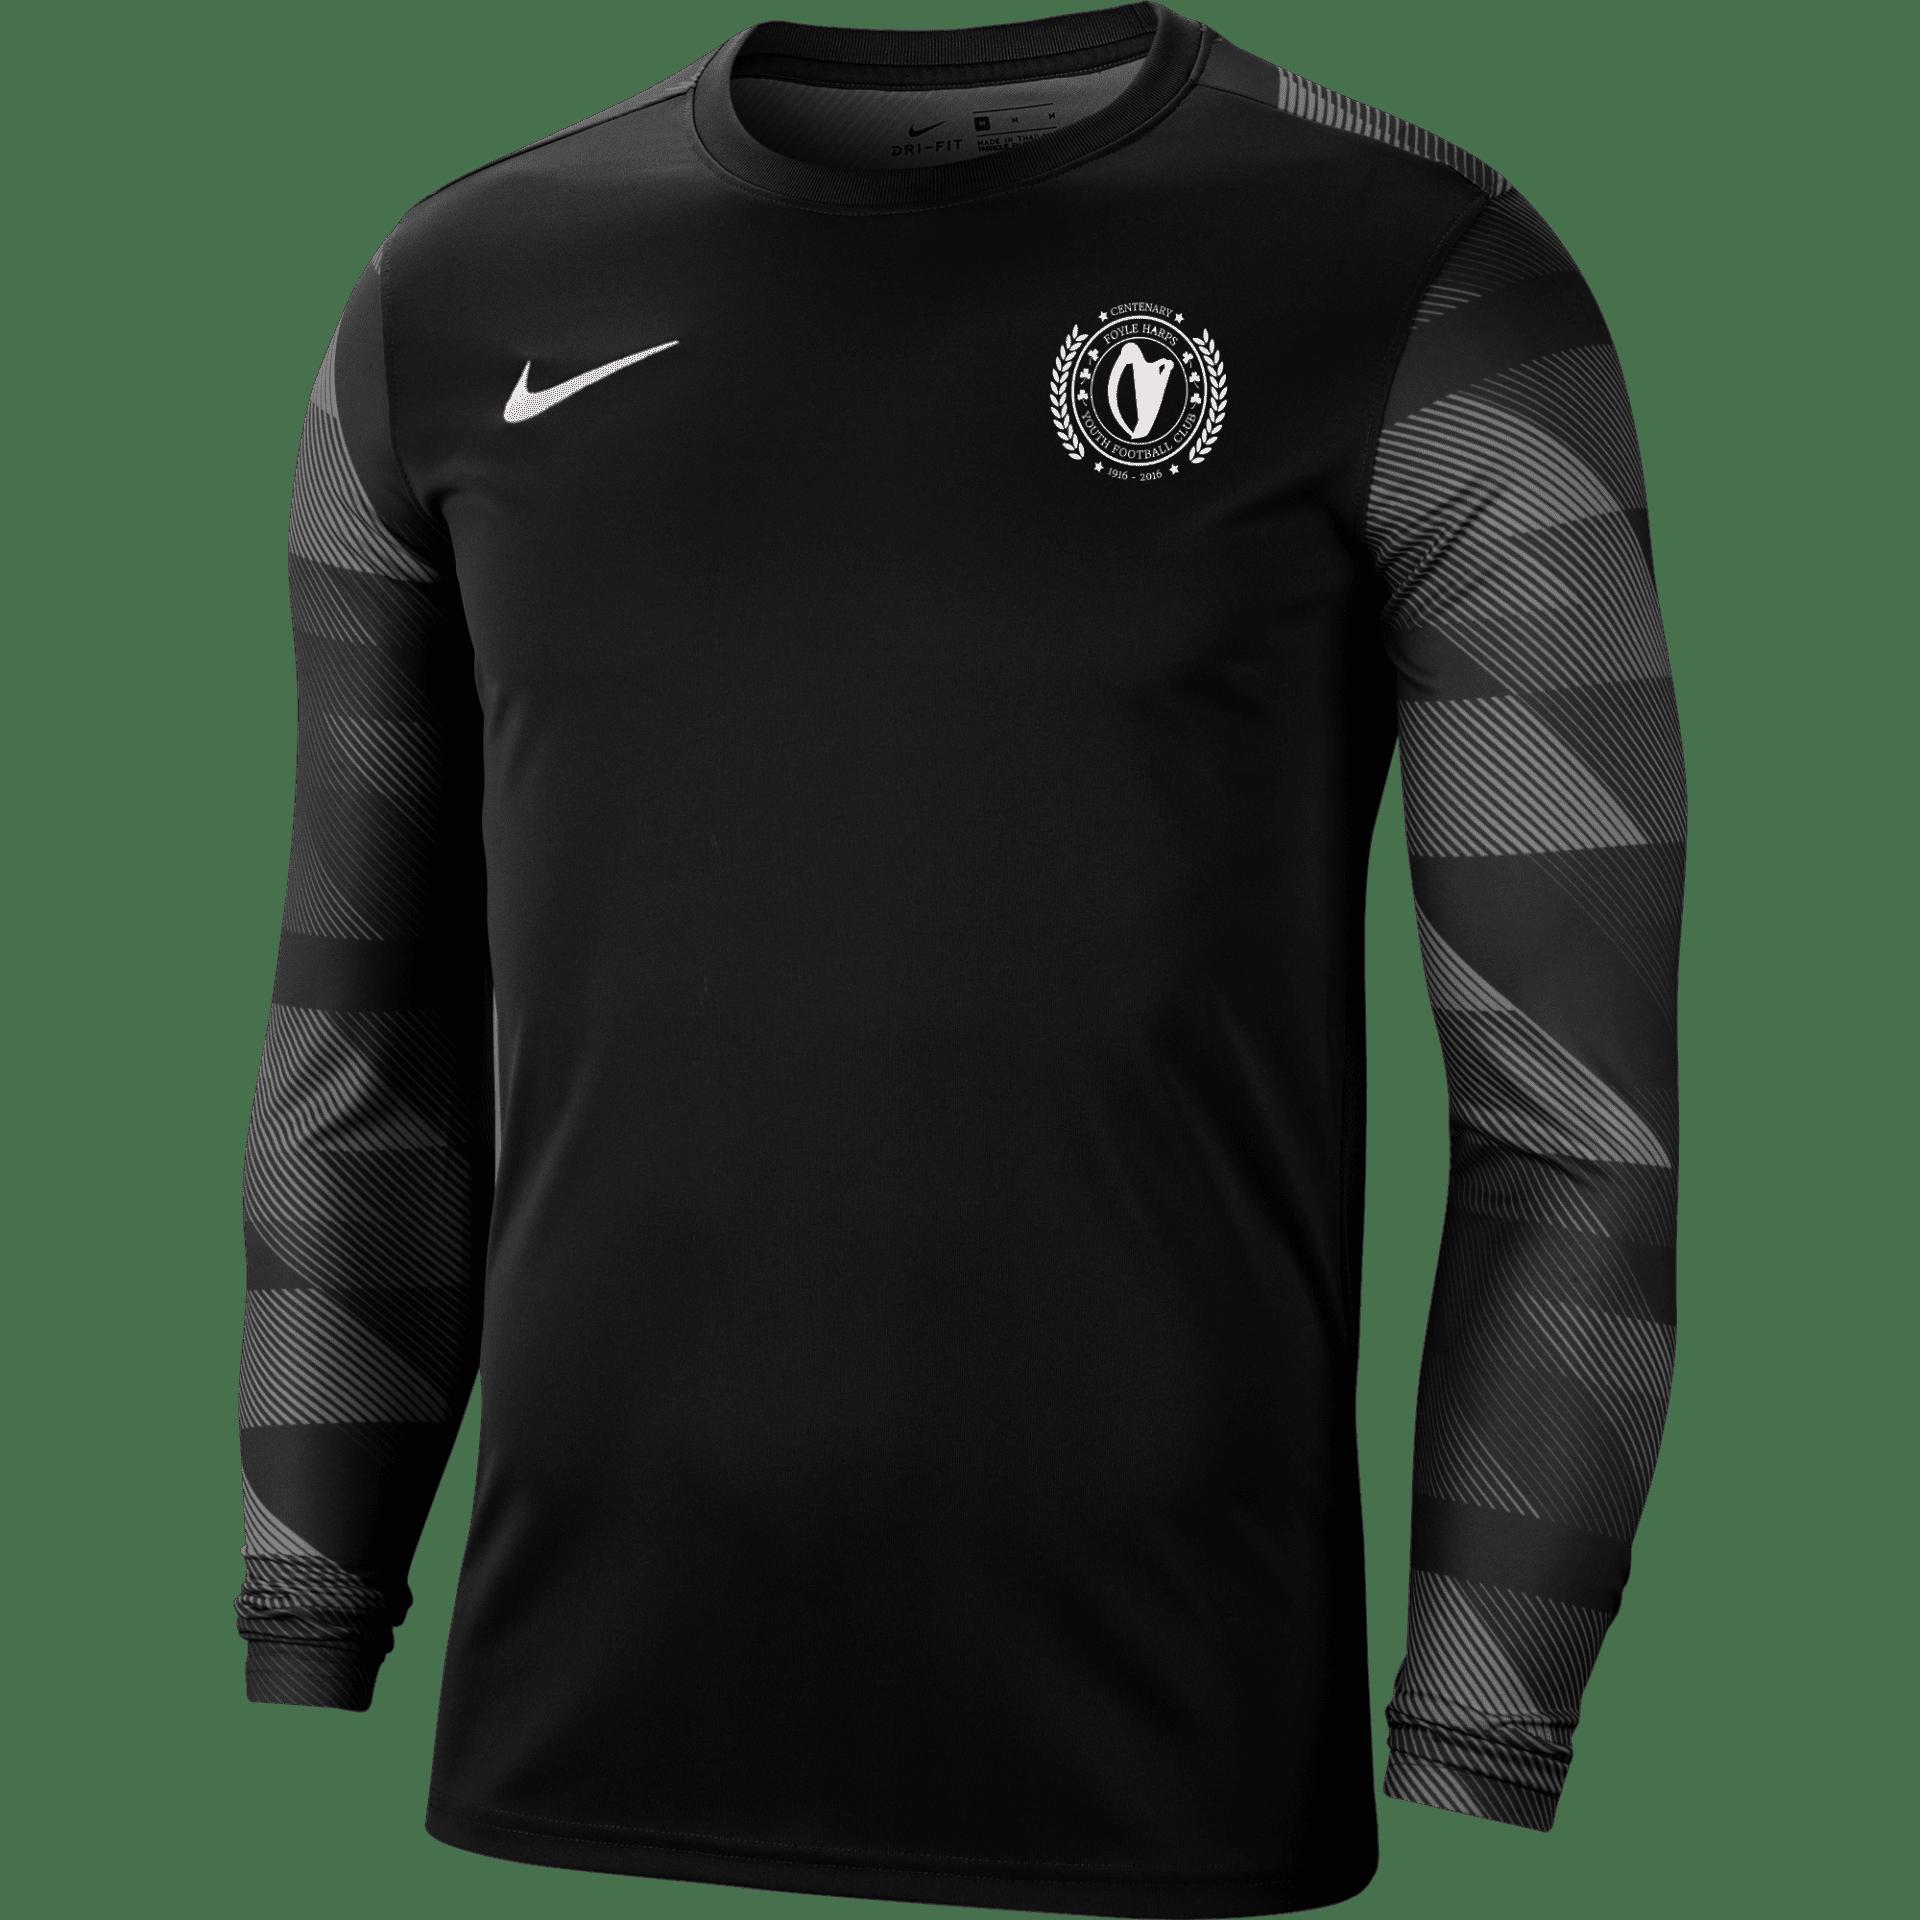 foyle harps goalkeeper jersey 31929 p